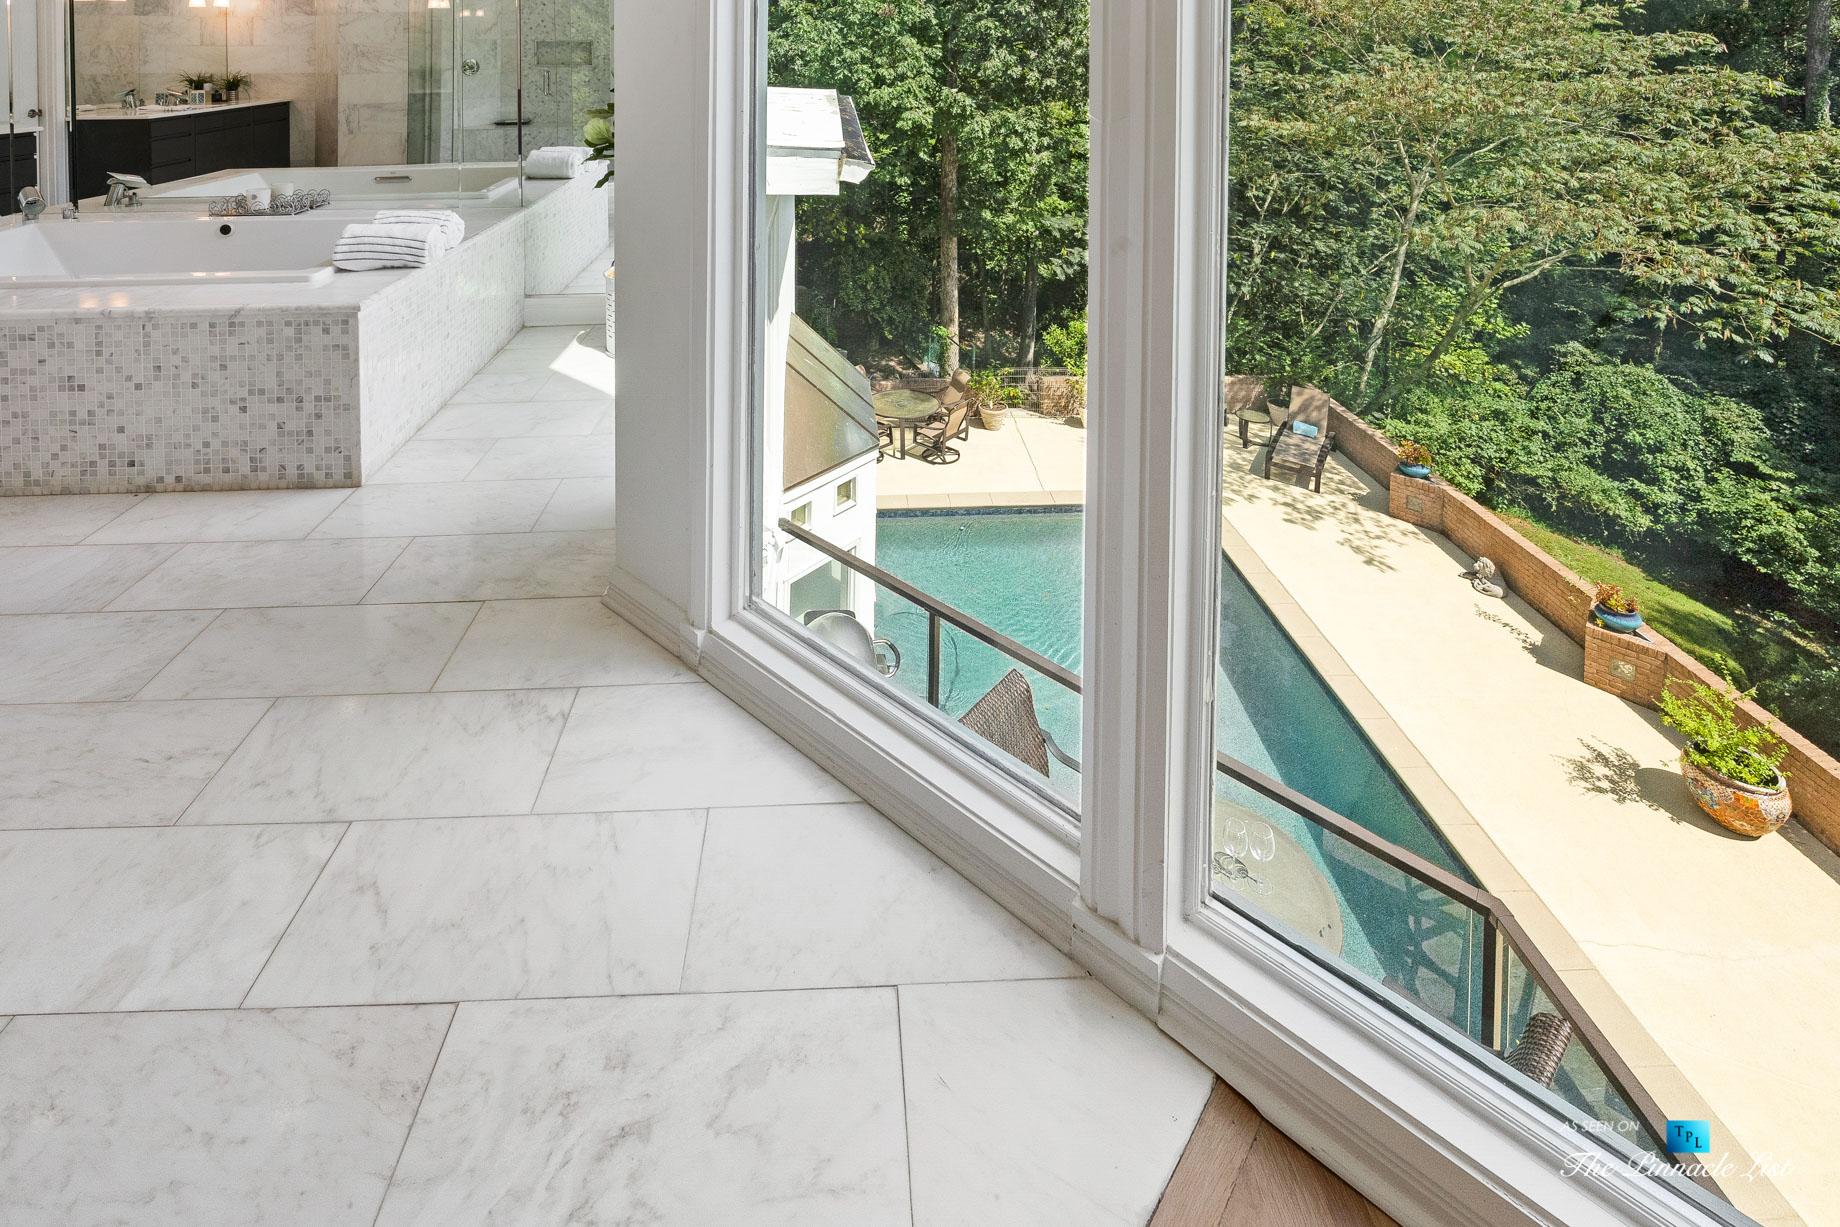 3906 Paces Ferry Rd NW, Atlanta, GA, USA – Master Bathroom Overlooking Pool – Luxury Real Estate – Buckhead Home